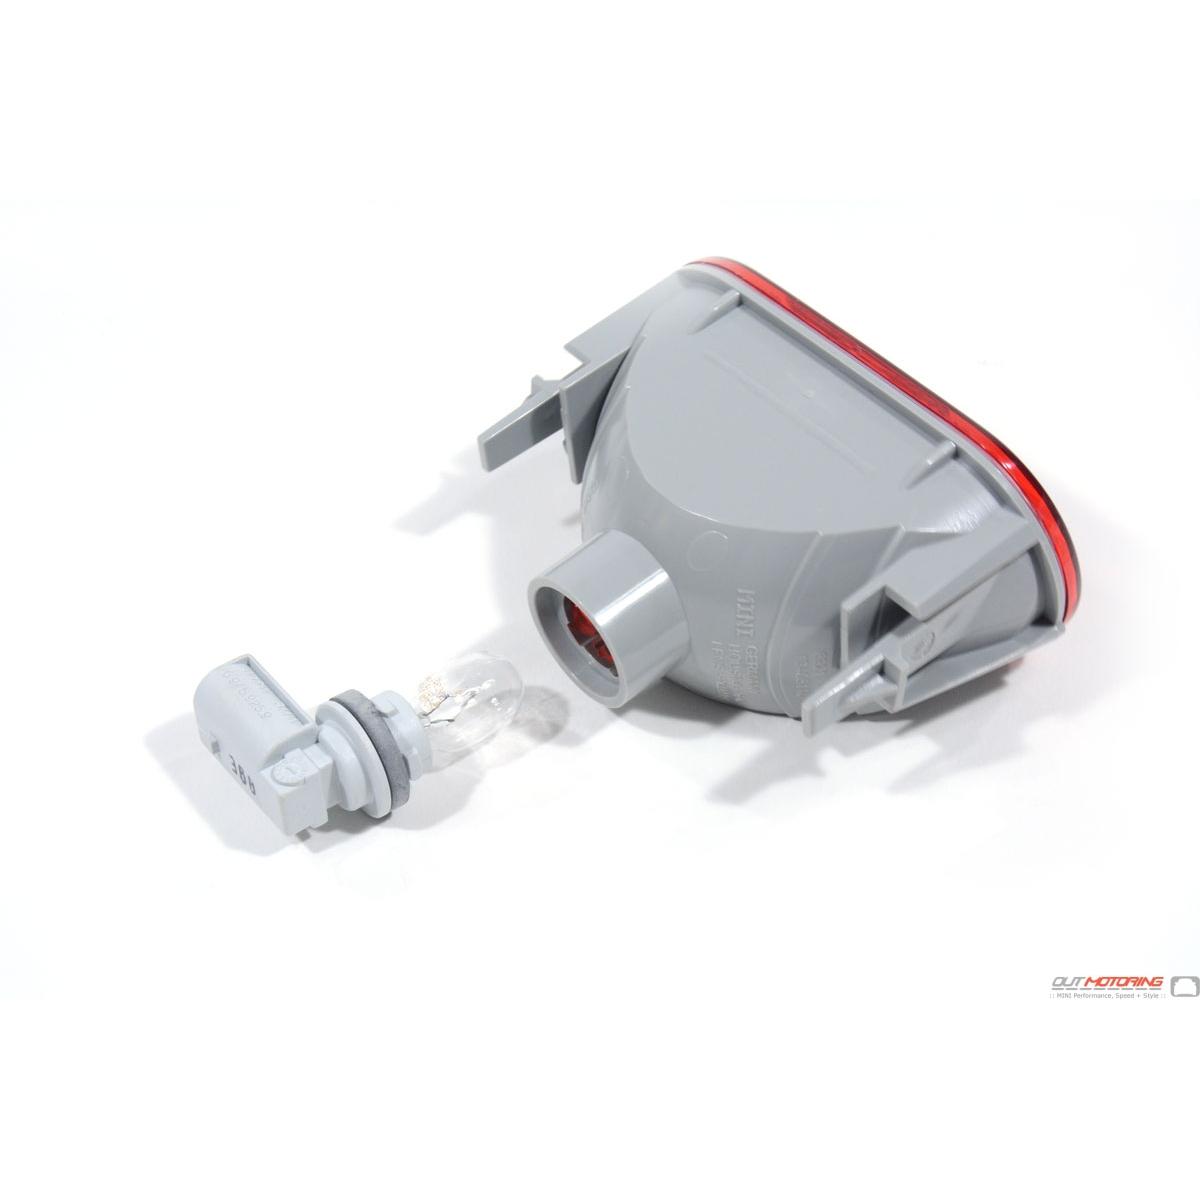 R53 MINI Cooper Rear Fog Lamp Lens kit - MINI Cooper ...